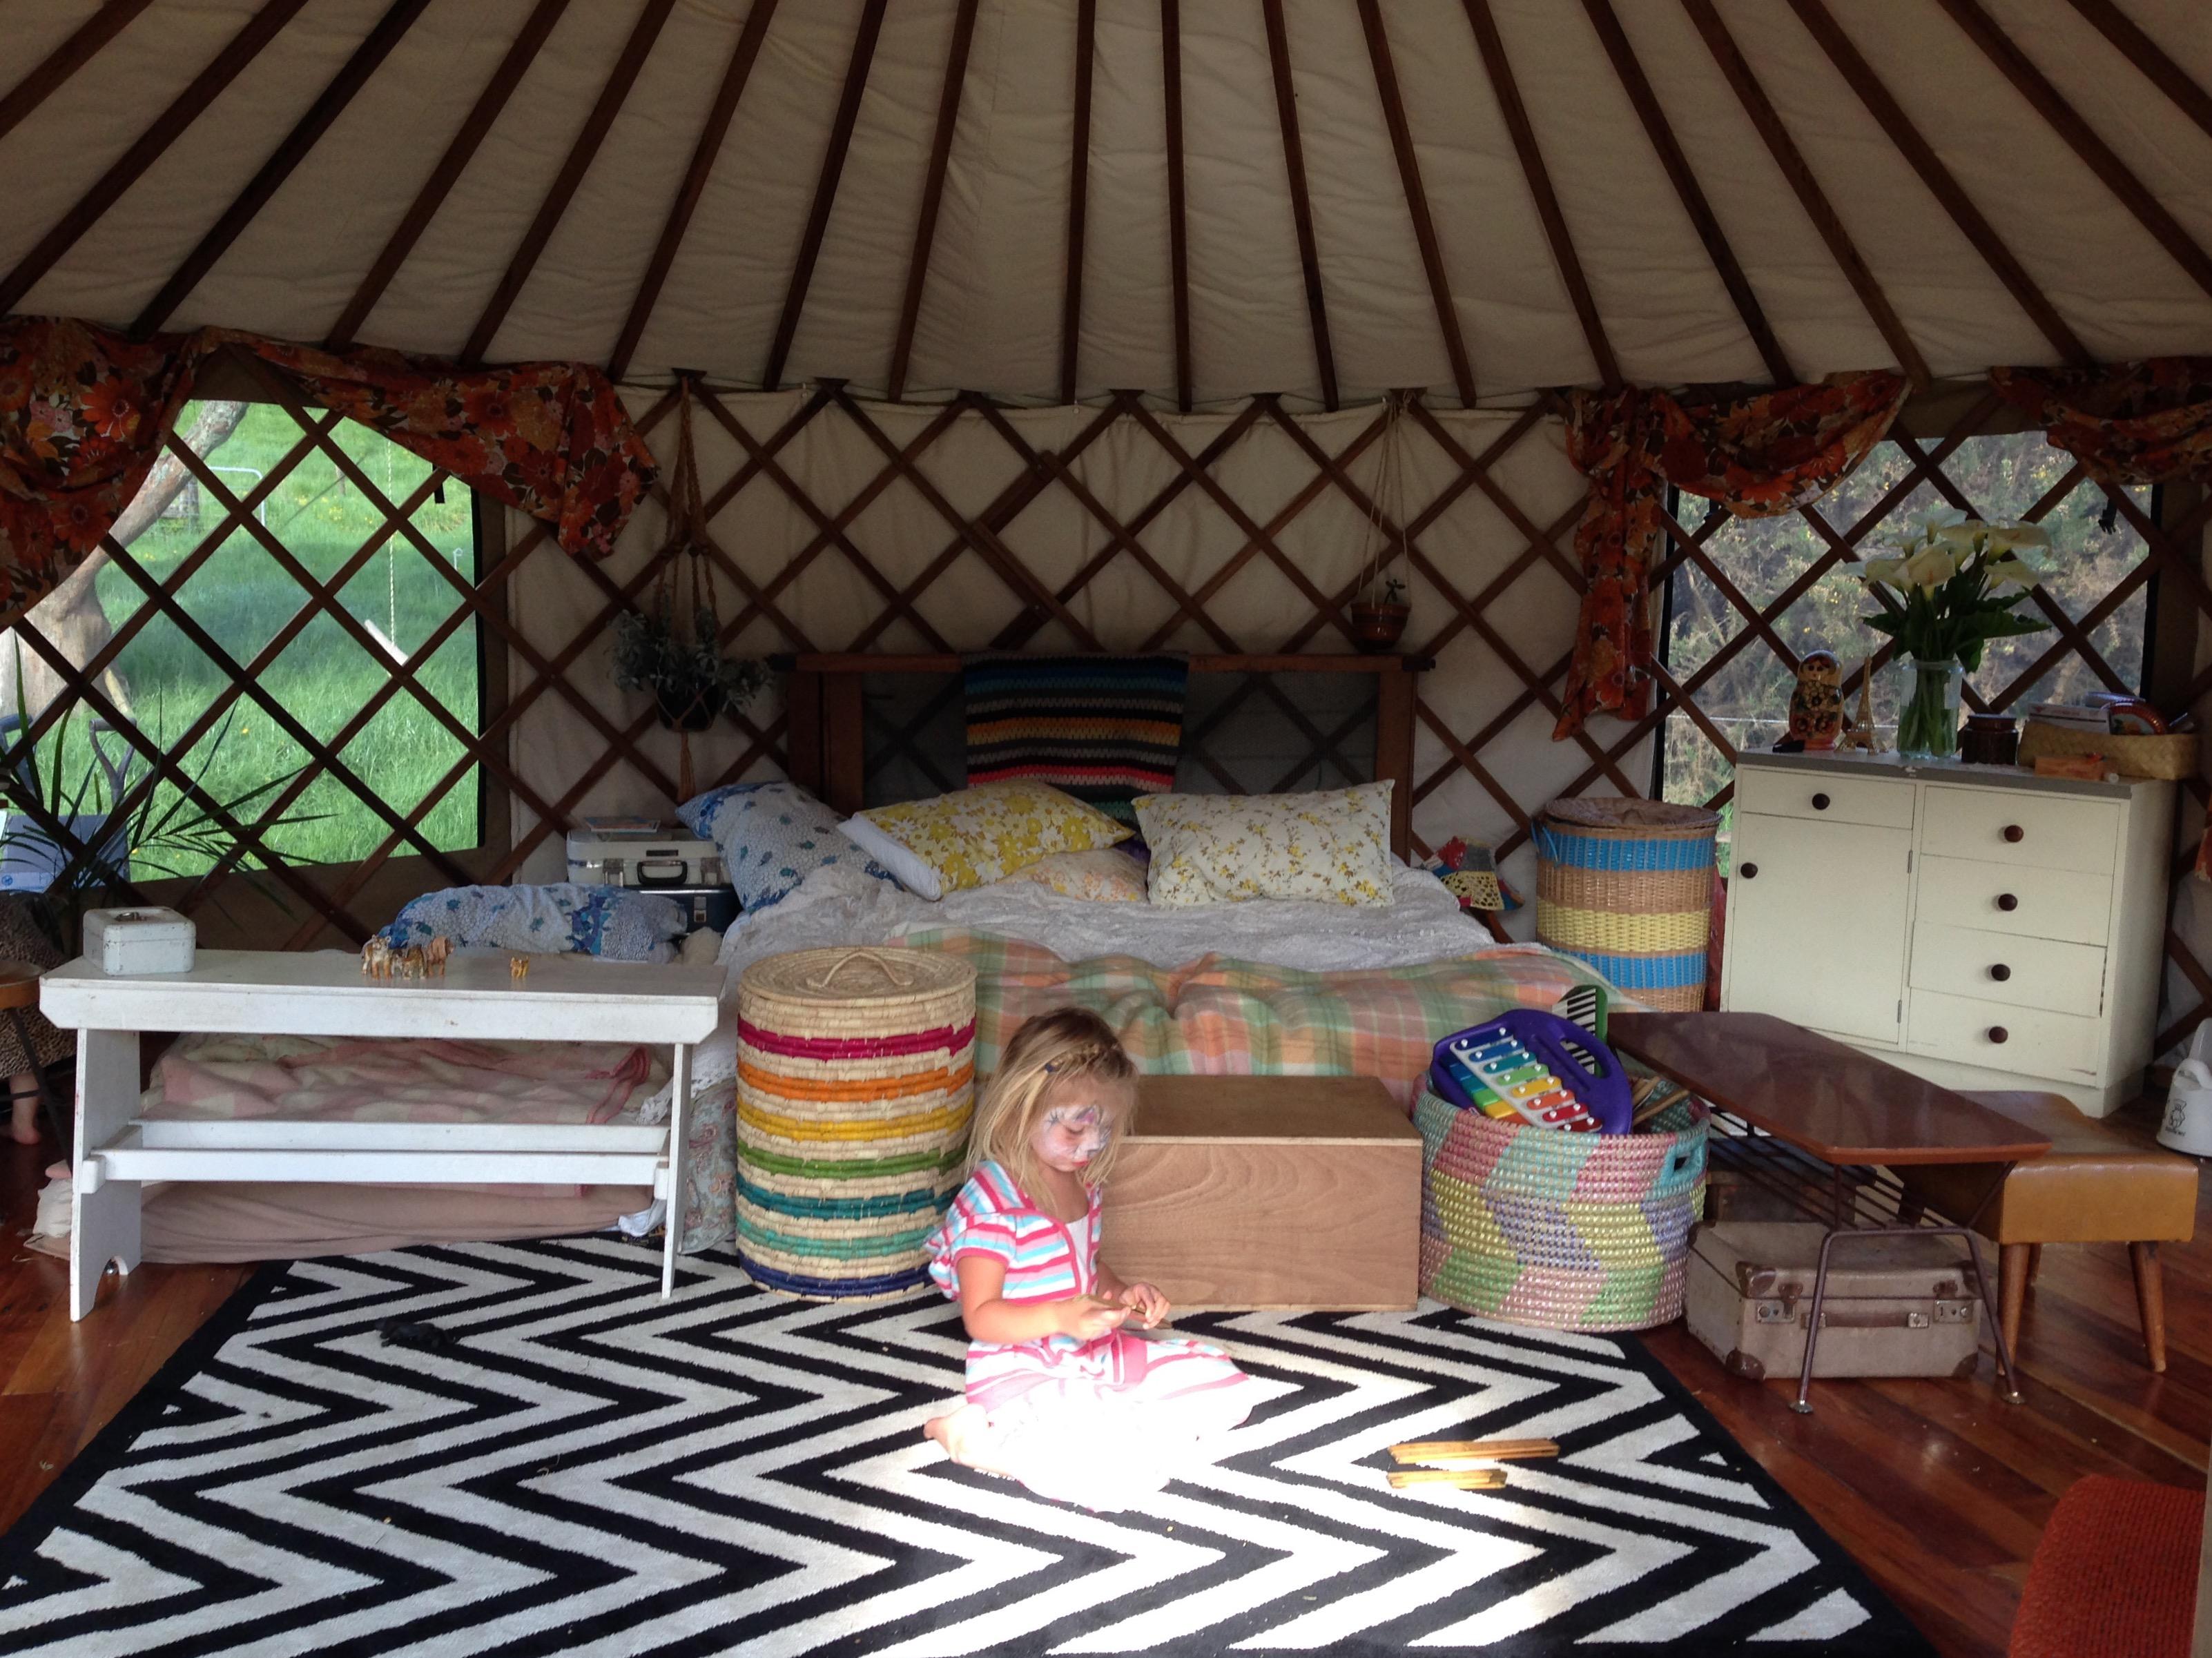 Family Living in a Yurt